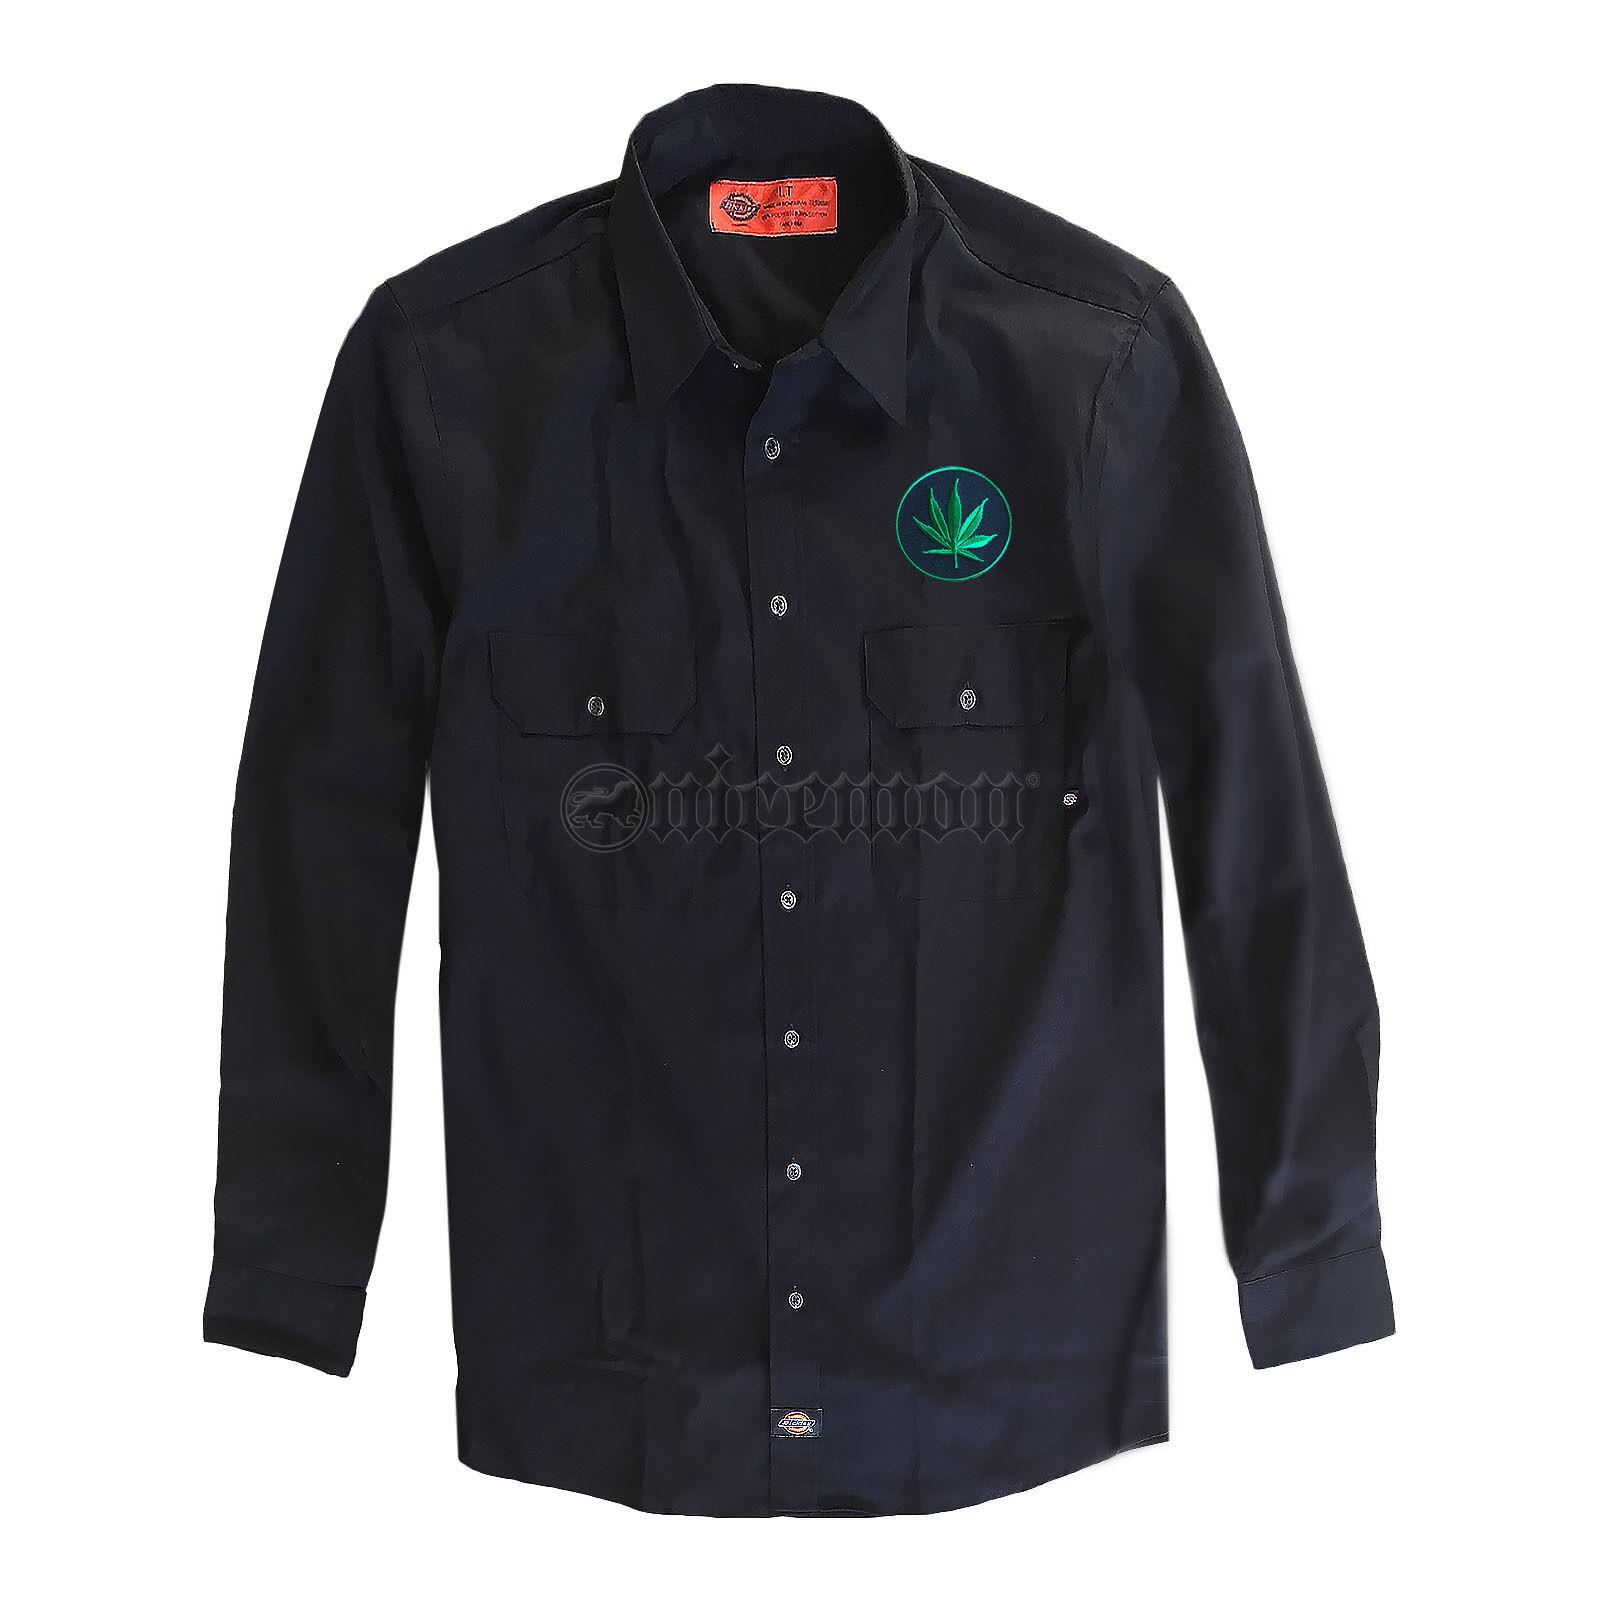 Cannabis Leaf Patch shirt Rasta Jamaica Hawaii Africa LT (Large Tall) FIT shirt